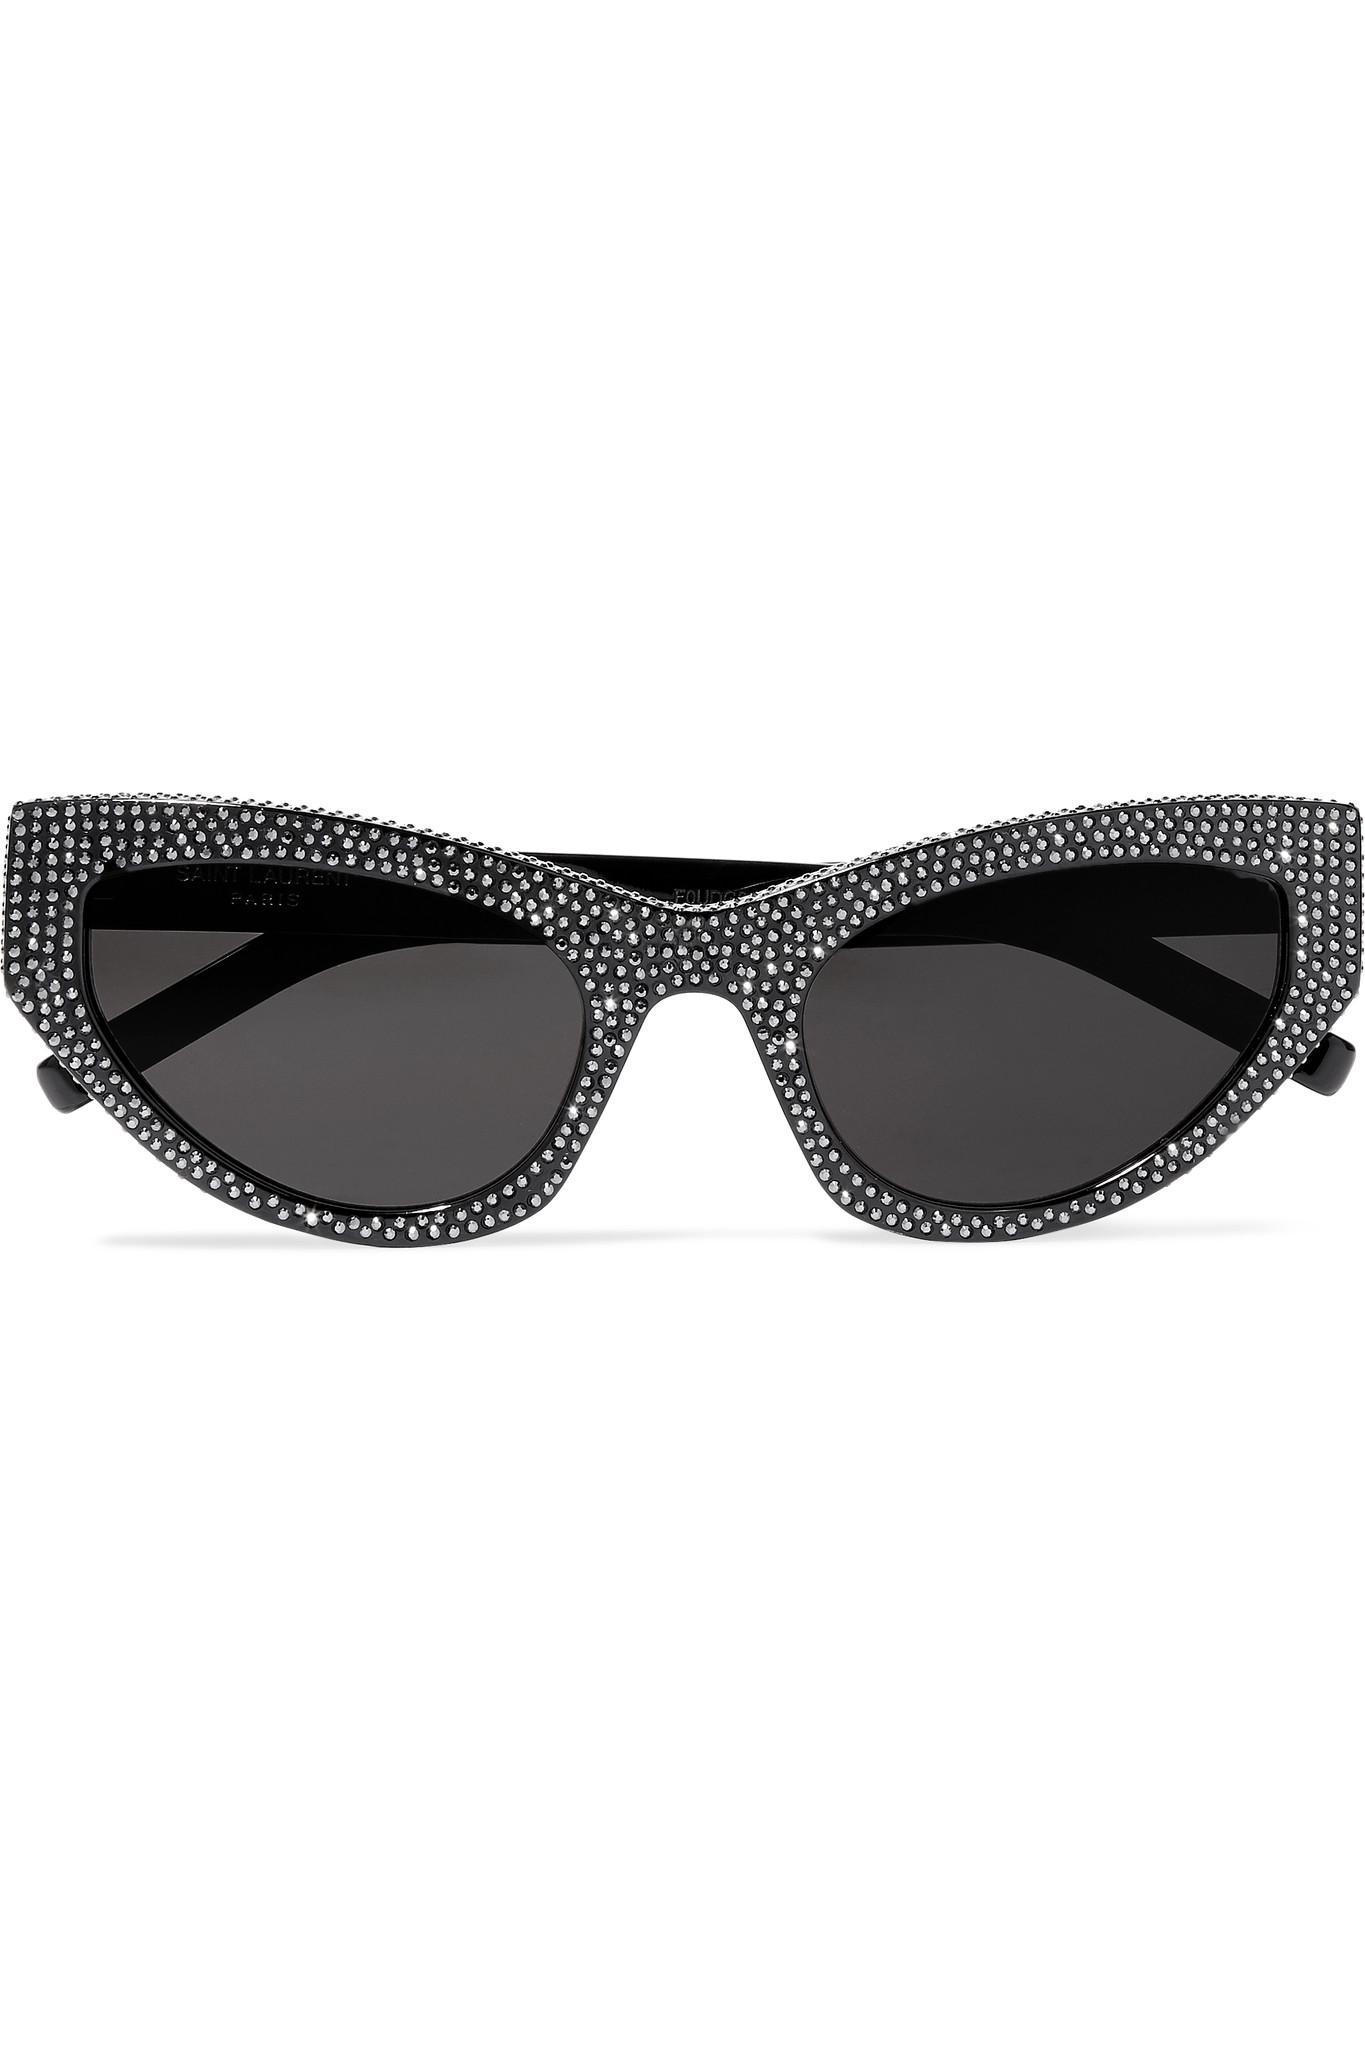 f98fac949b4 Saint Laurent Crystal-embellished Cat-eye Acetate Sunglasses in ...